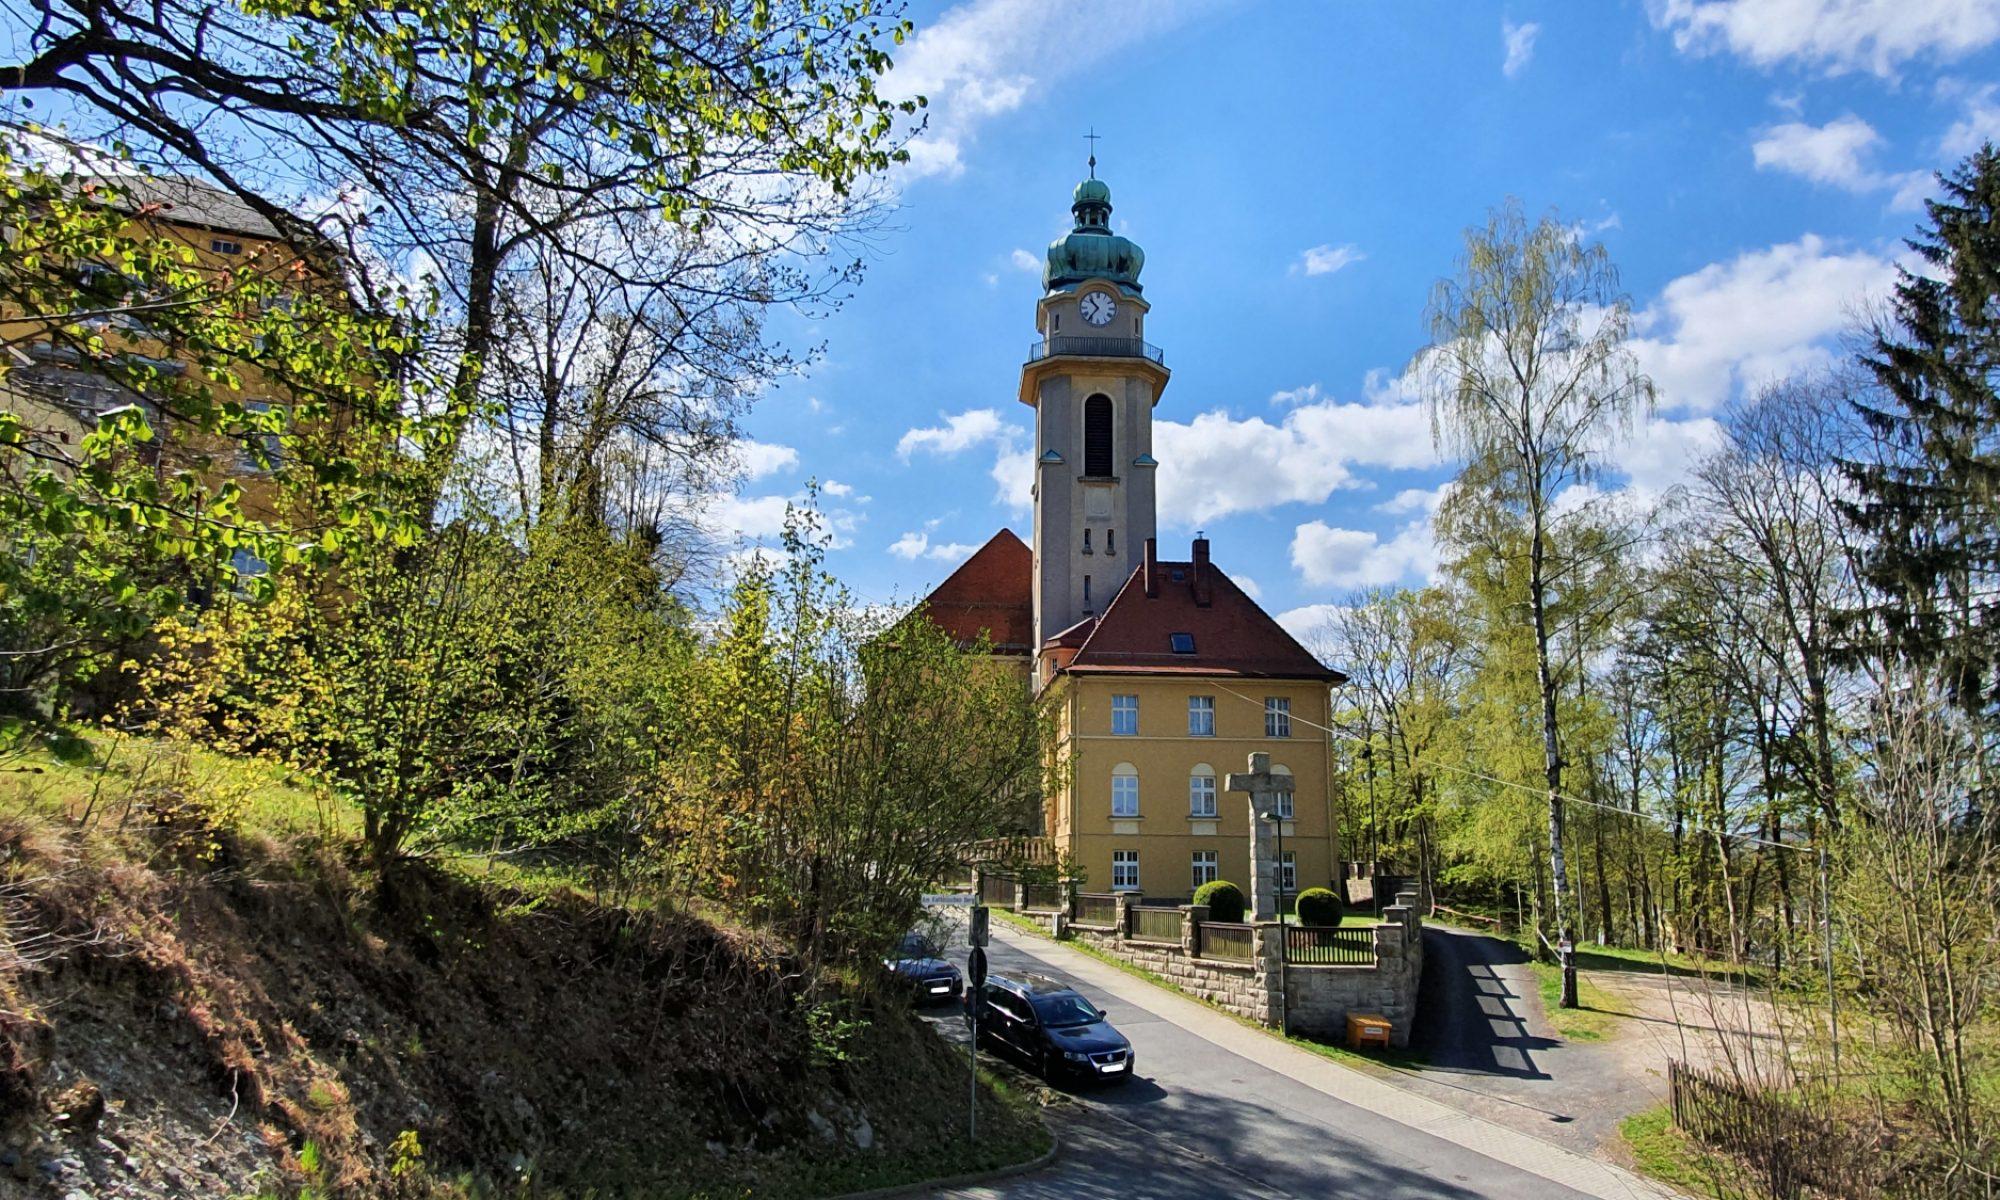 Katholische Pfarrei Sankt Christophorus Auerbach/Vogtl.